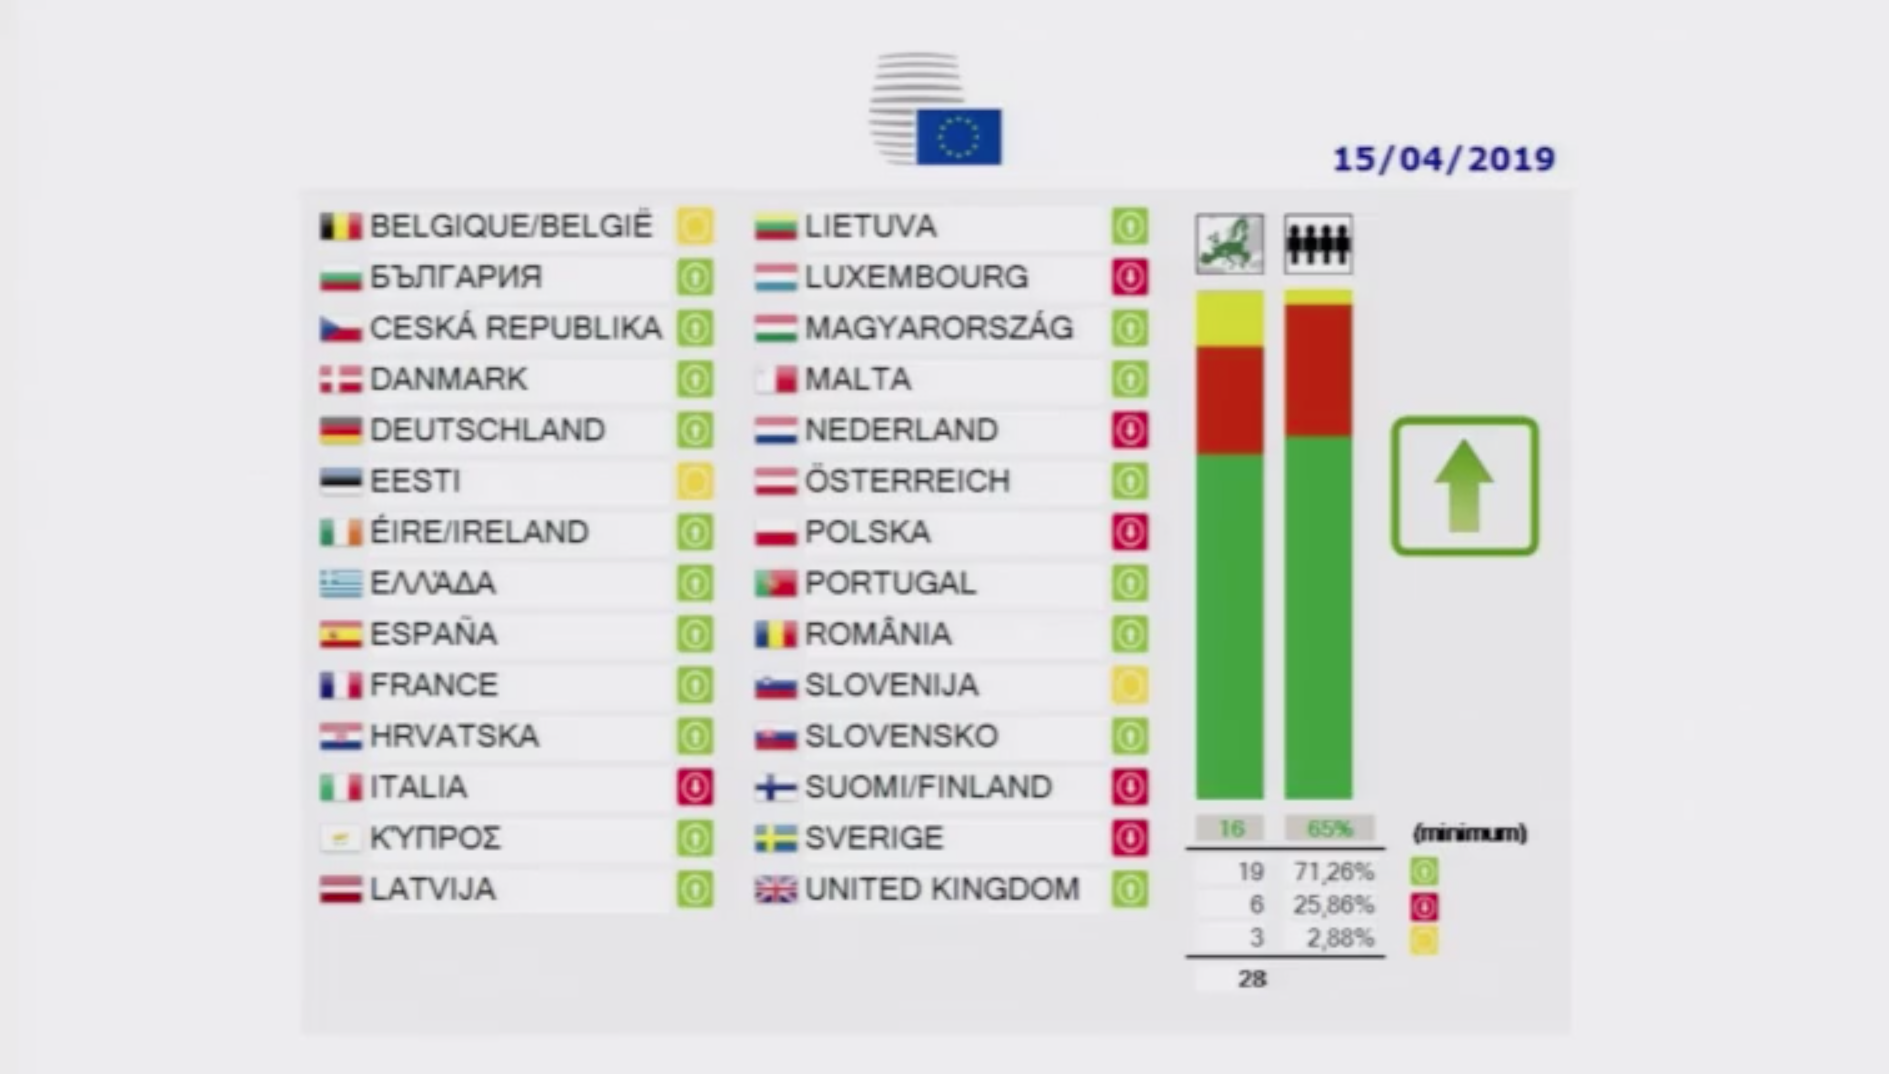 EU-Urheberrecht Abstimmungsergebnisse